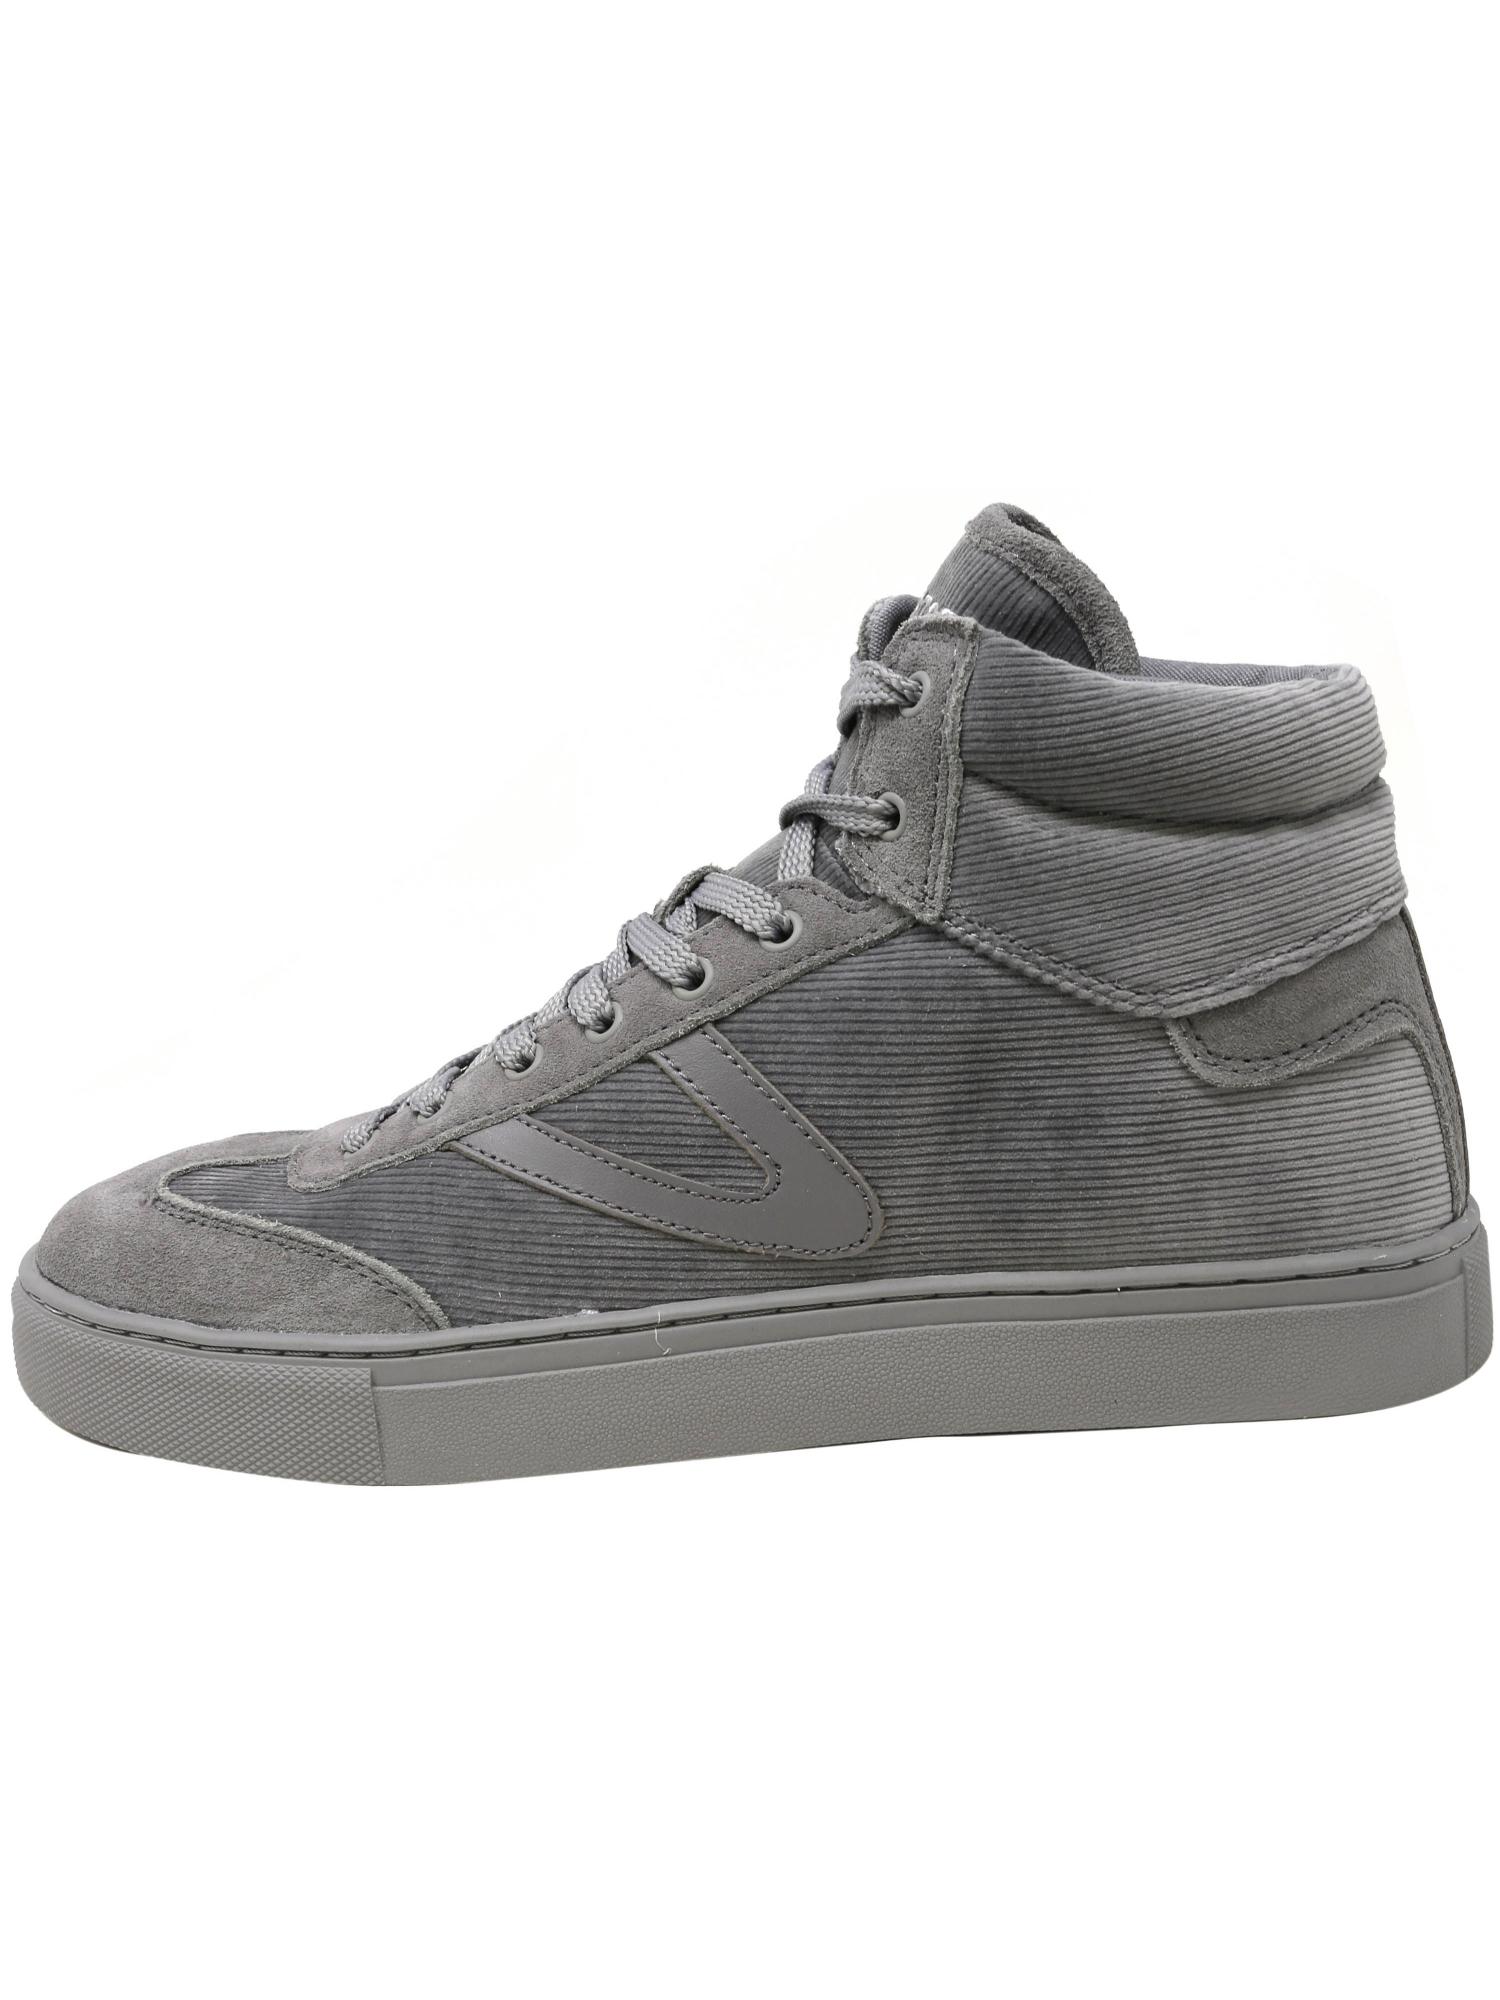 Tretorn Men/'s Jack Corduroy Suede High-Top Fashion Sneaker